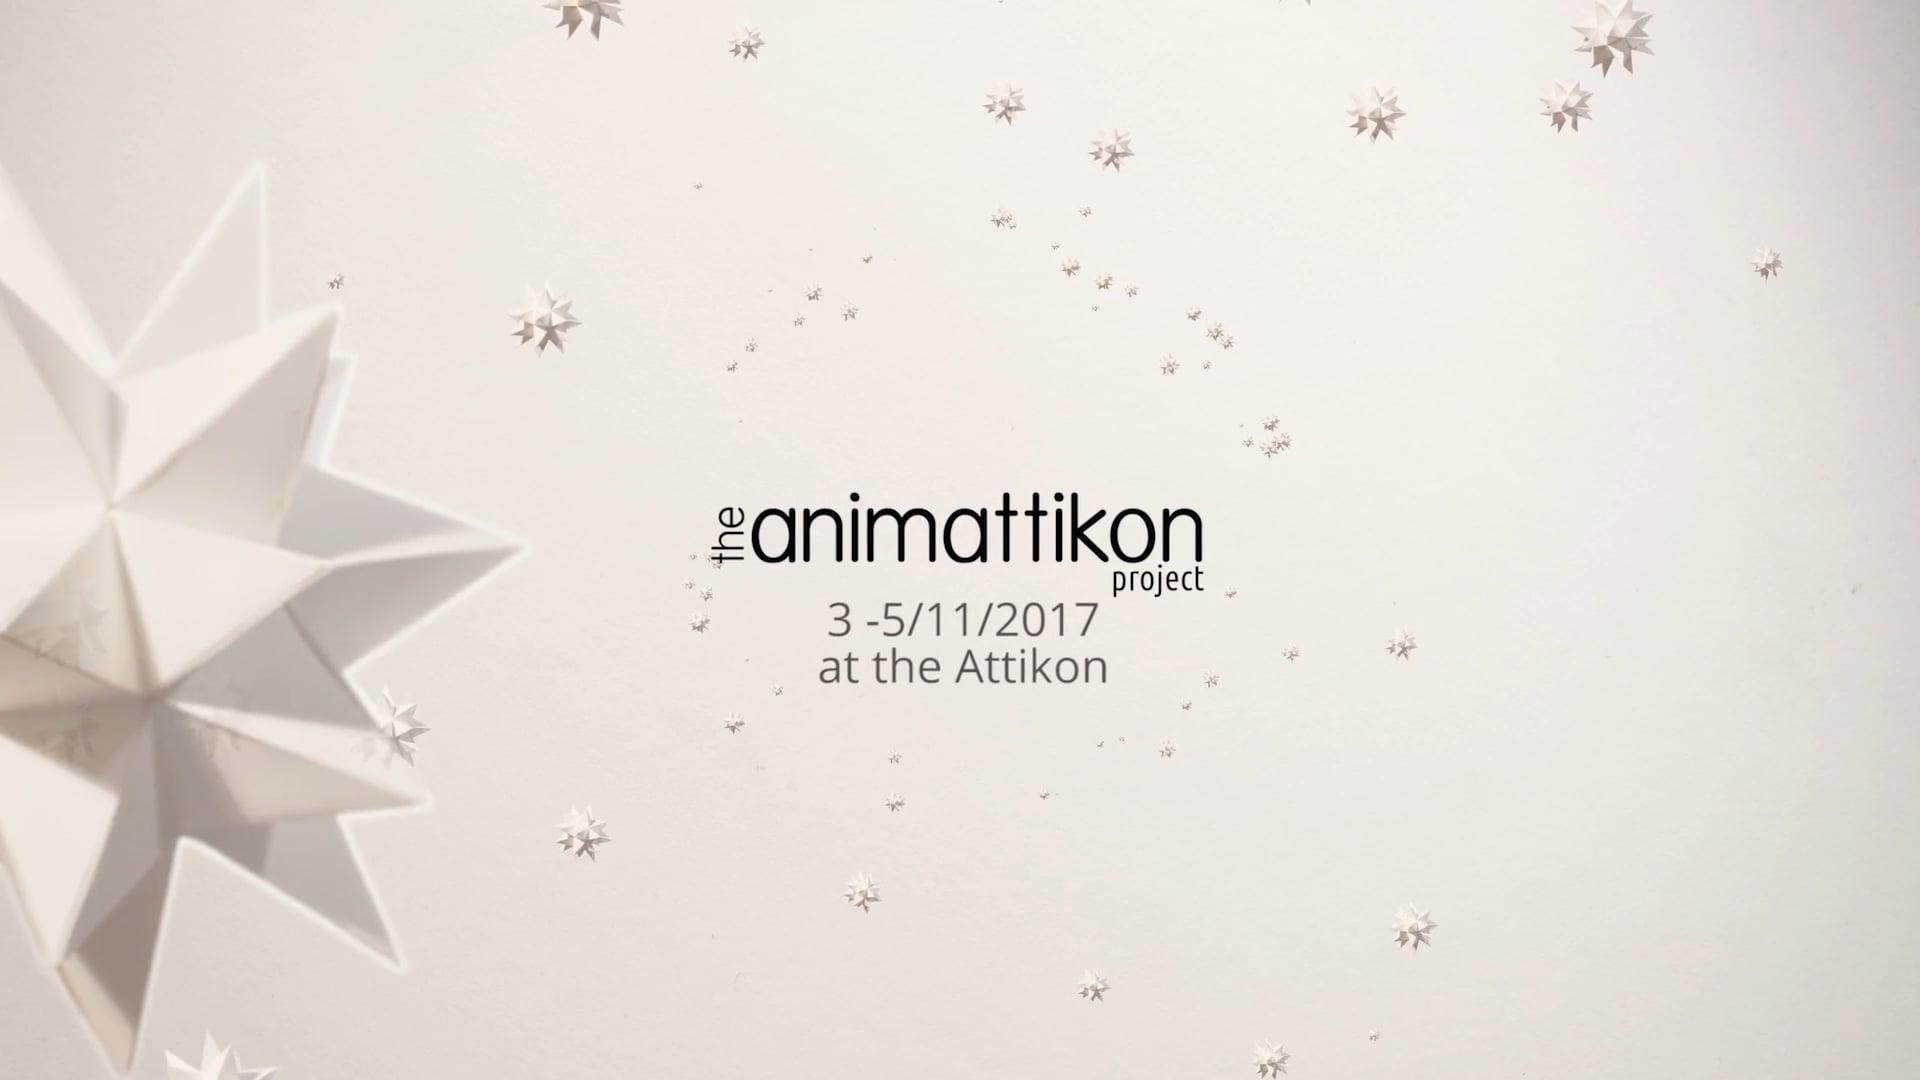 The Animattikon Project / Official Selection Trailer